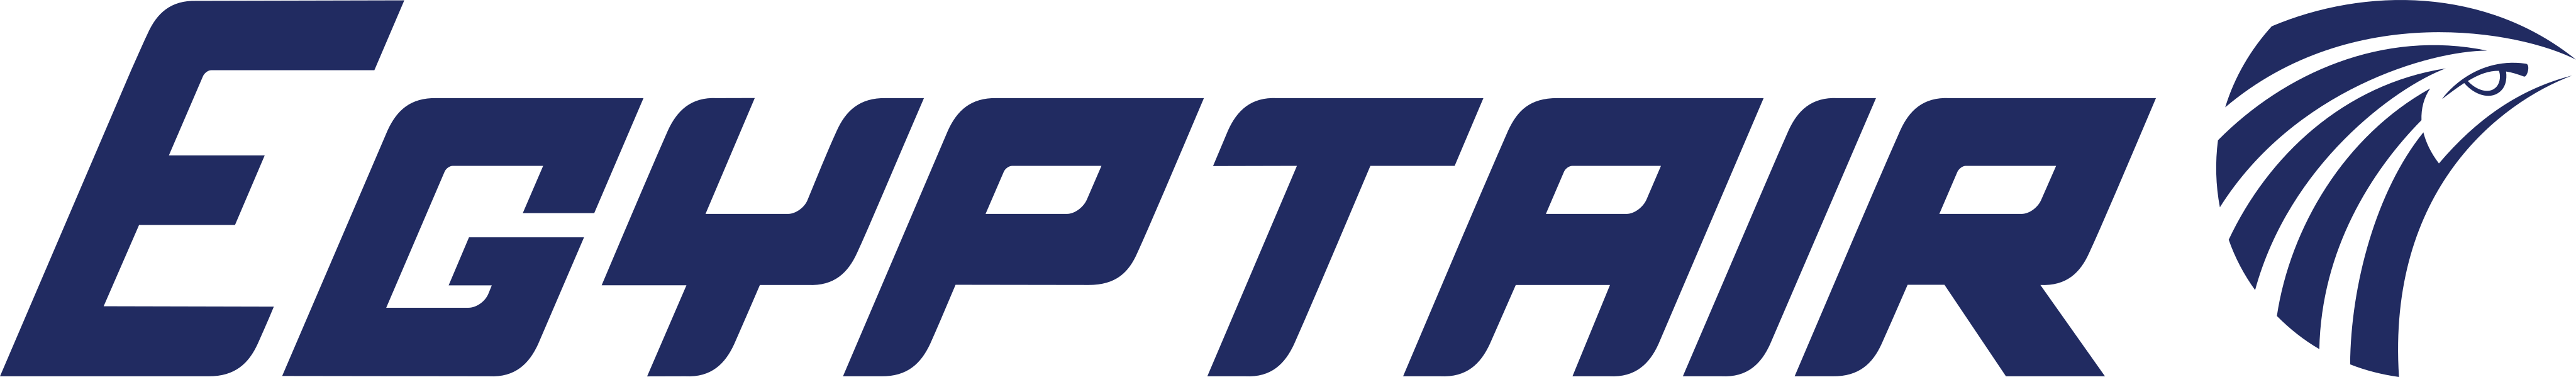 Egyptair logo.